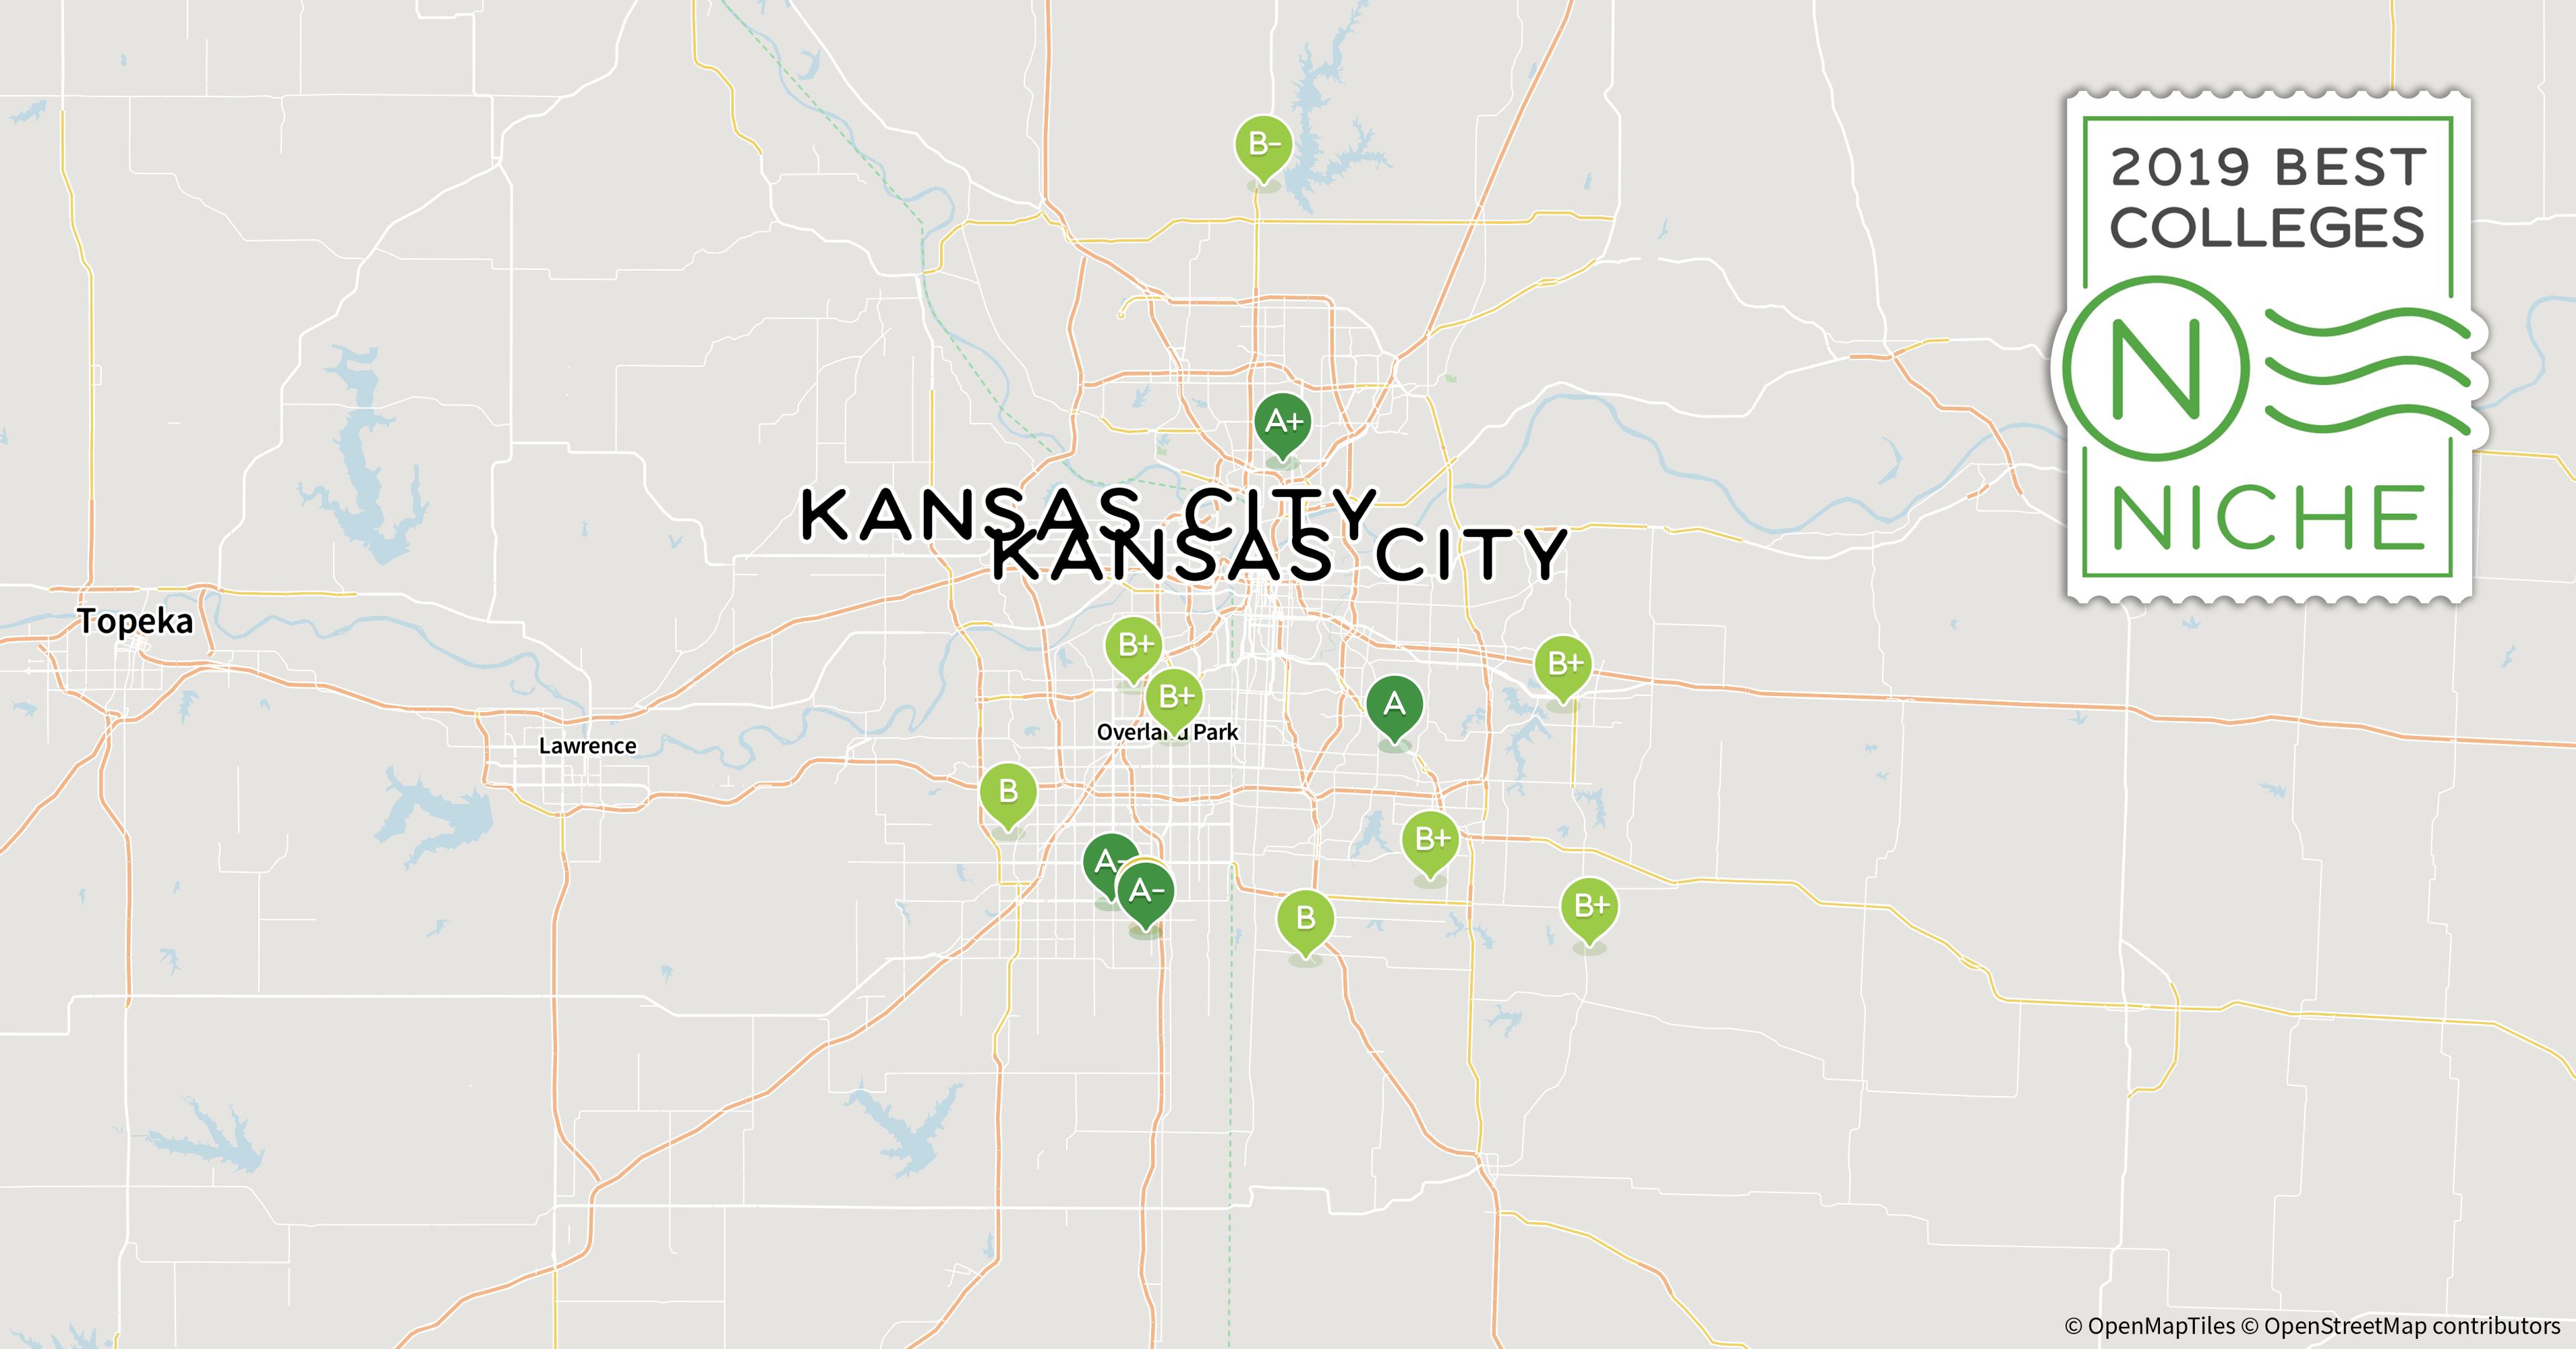 Kansas City Colleges >> 2019 Best Business Schools In Kansas City Area Niche